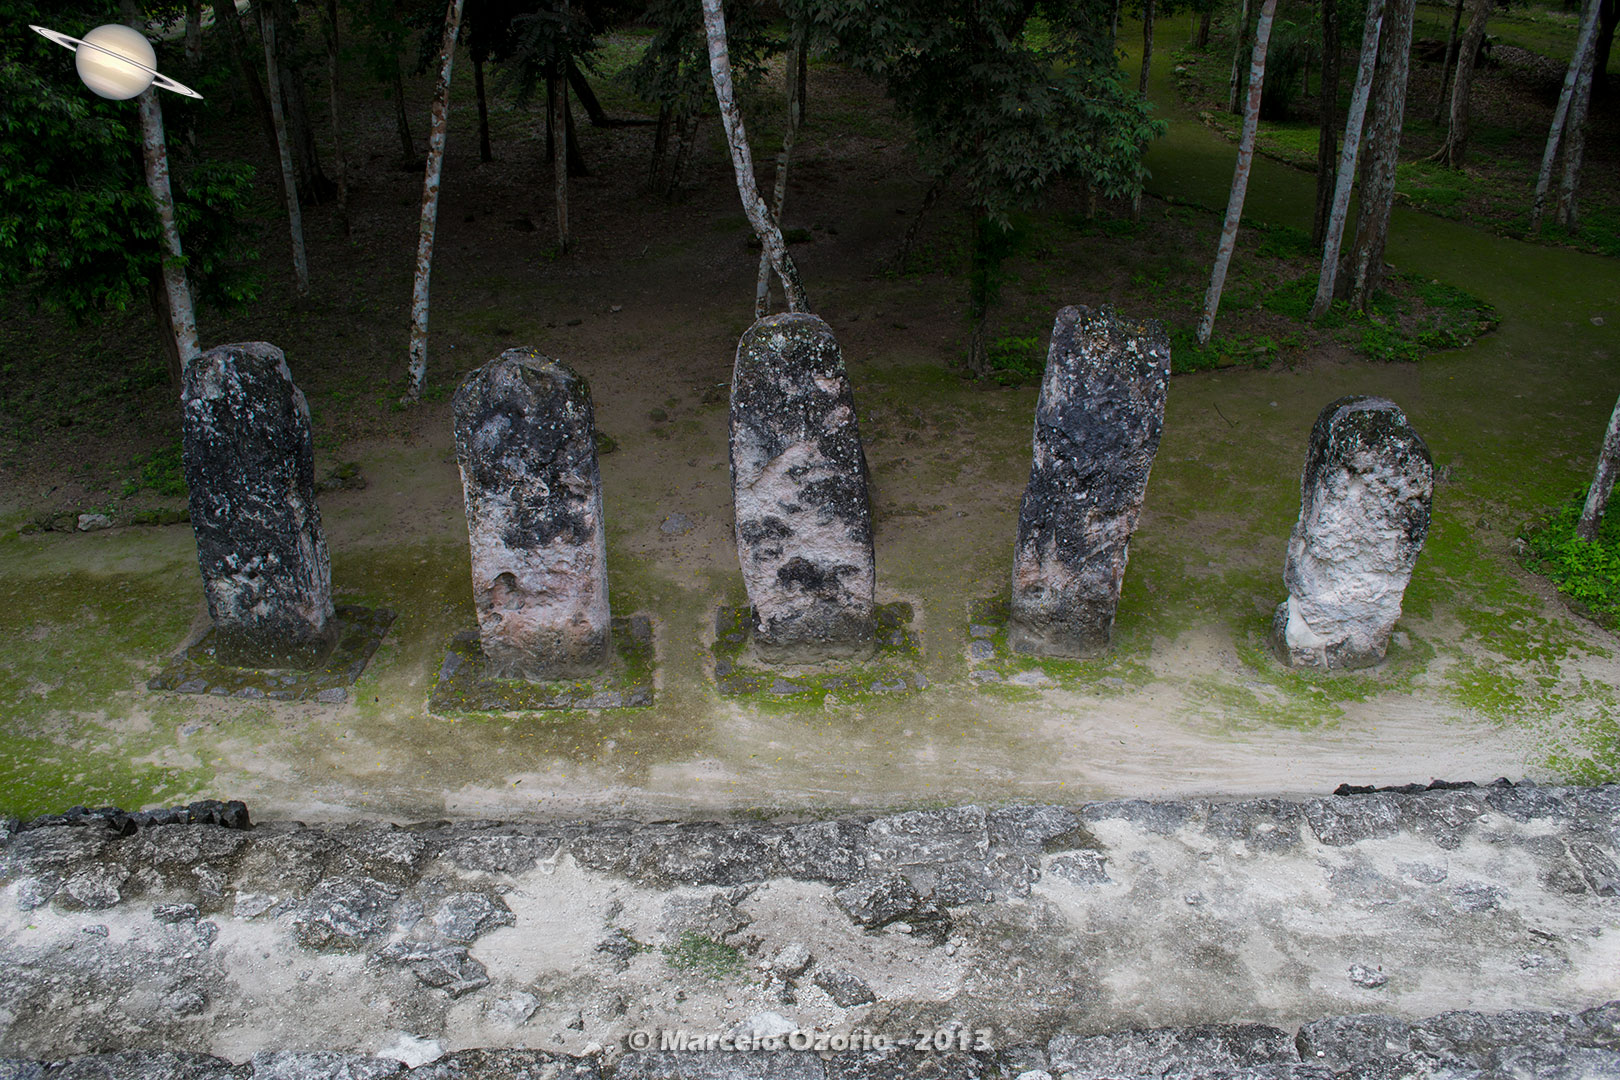 calakmul mayan civilization mexico 23 - Calakmul, City of the Two Adjacent Pyramids - Mexico